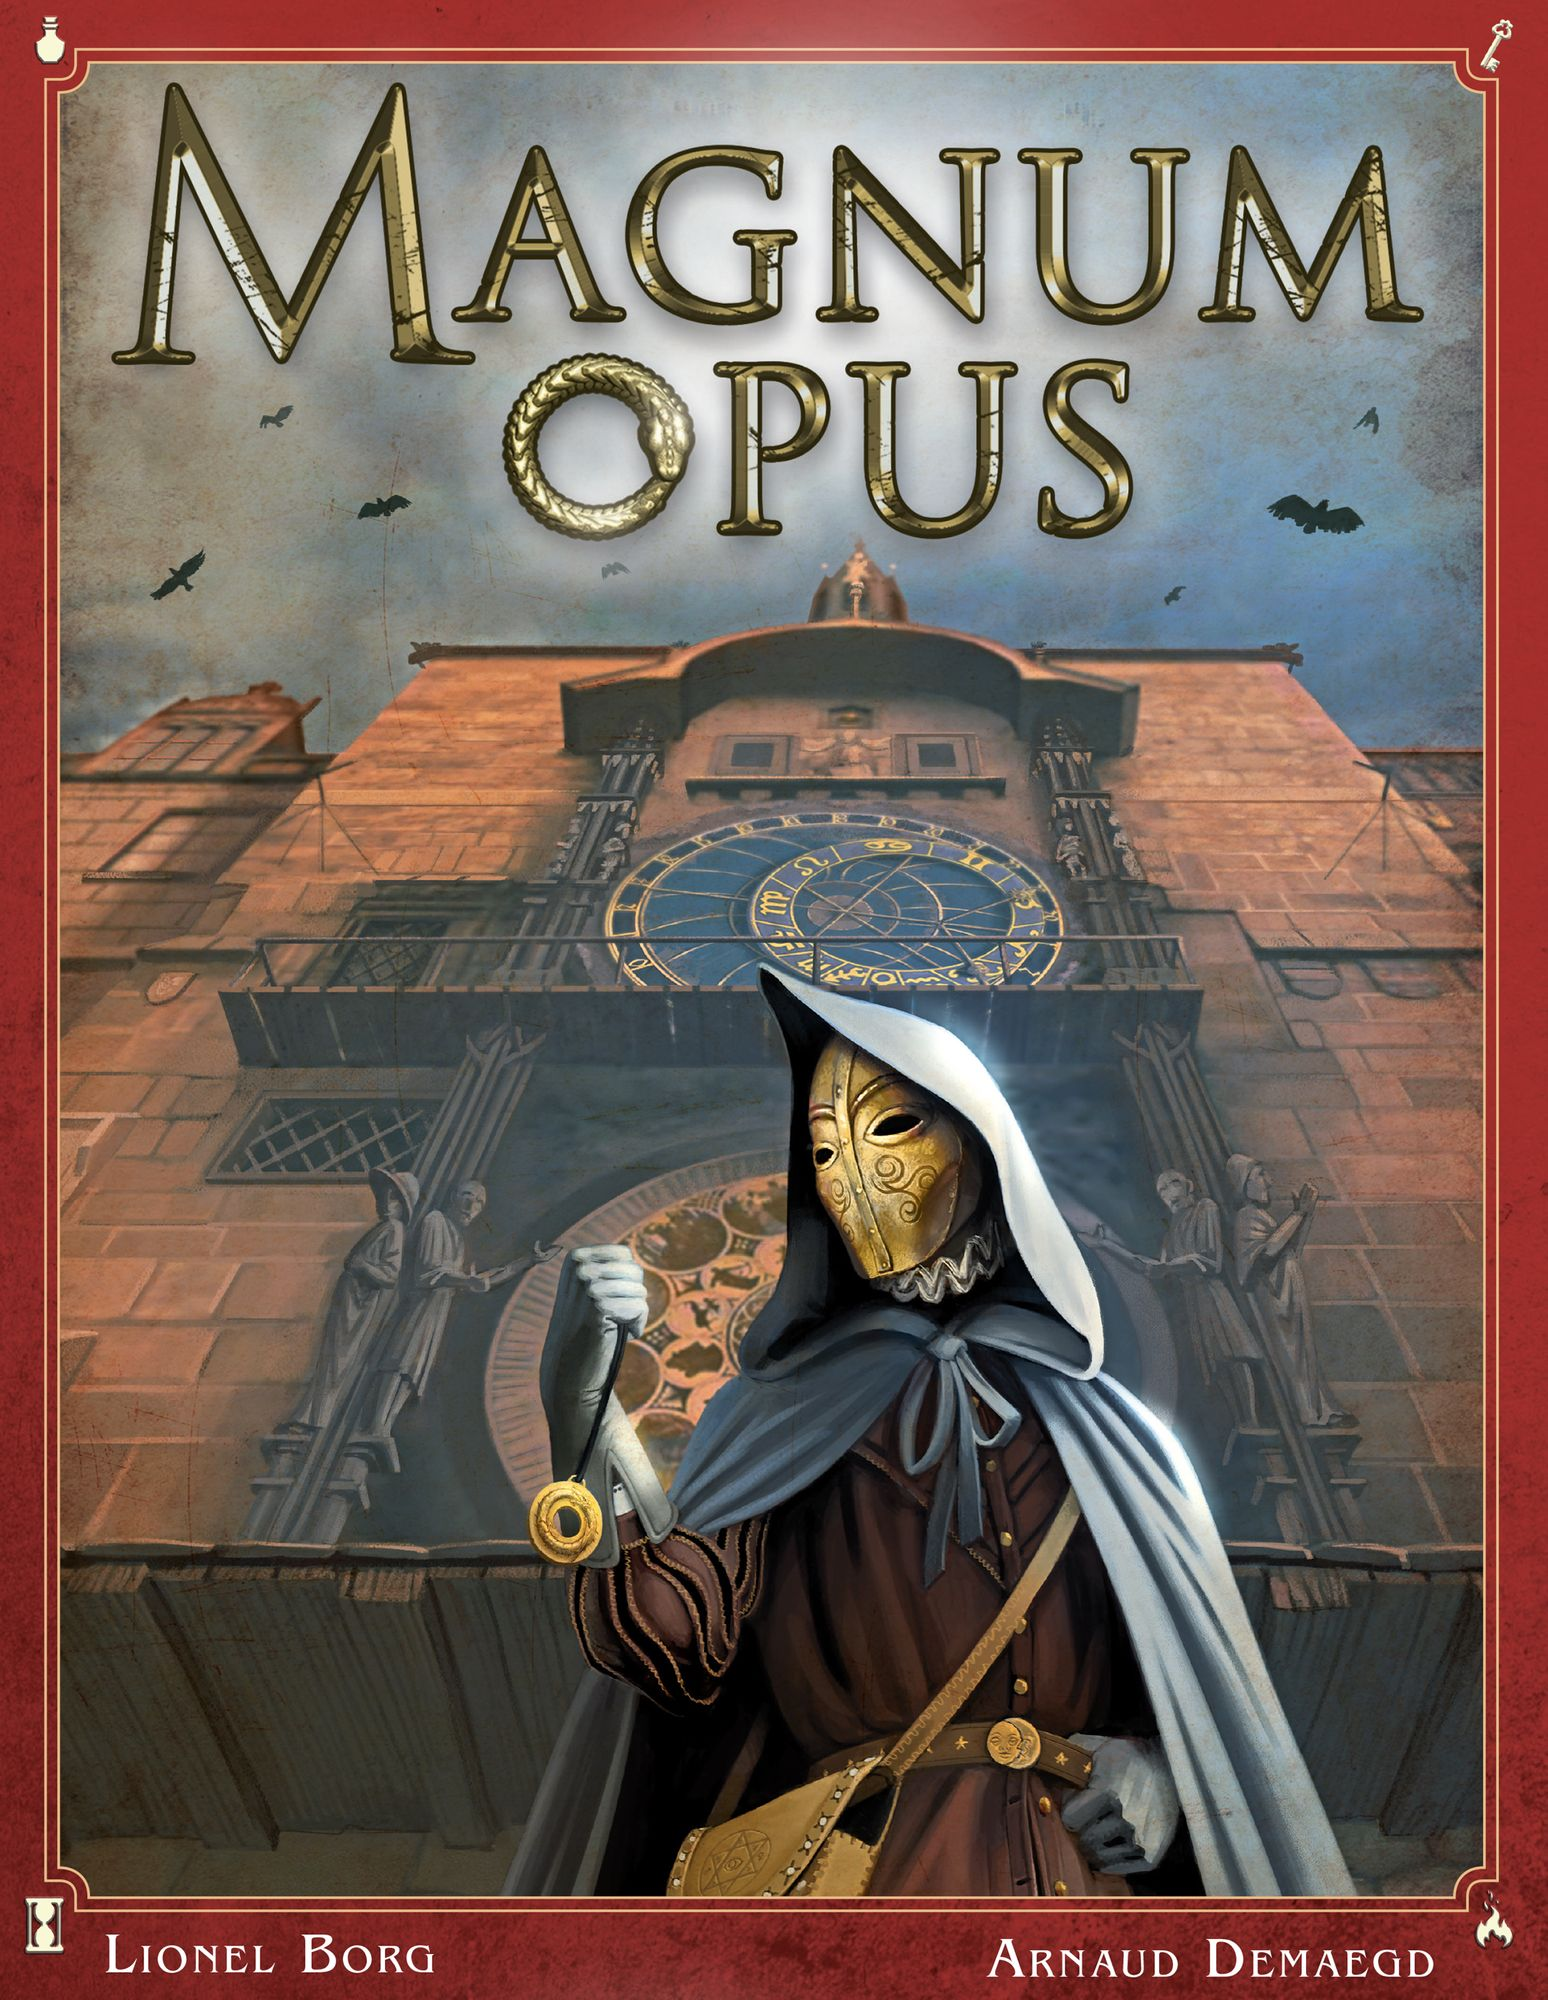 Magnum Opus: The Great Work